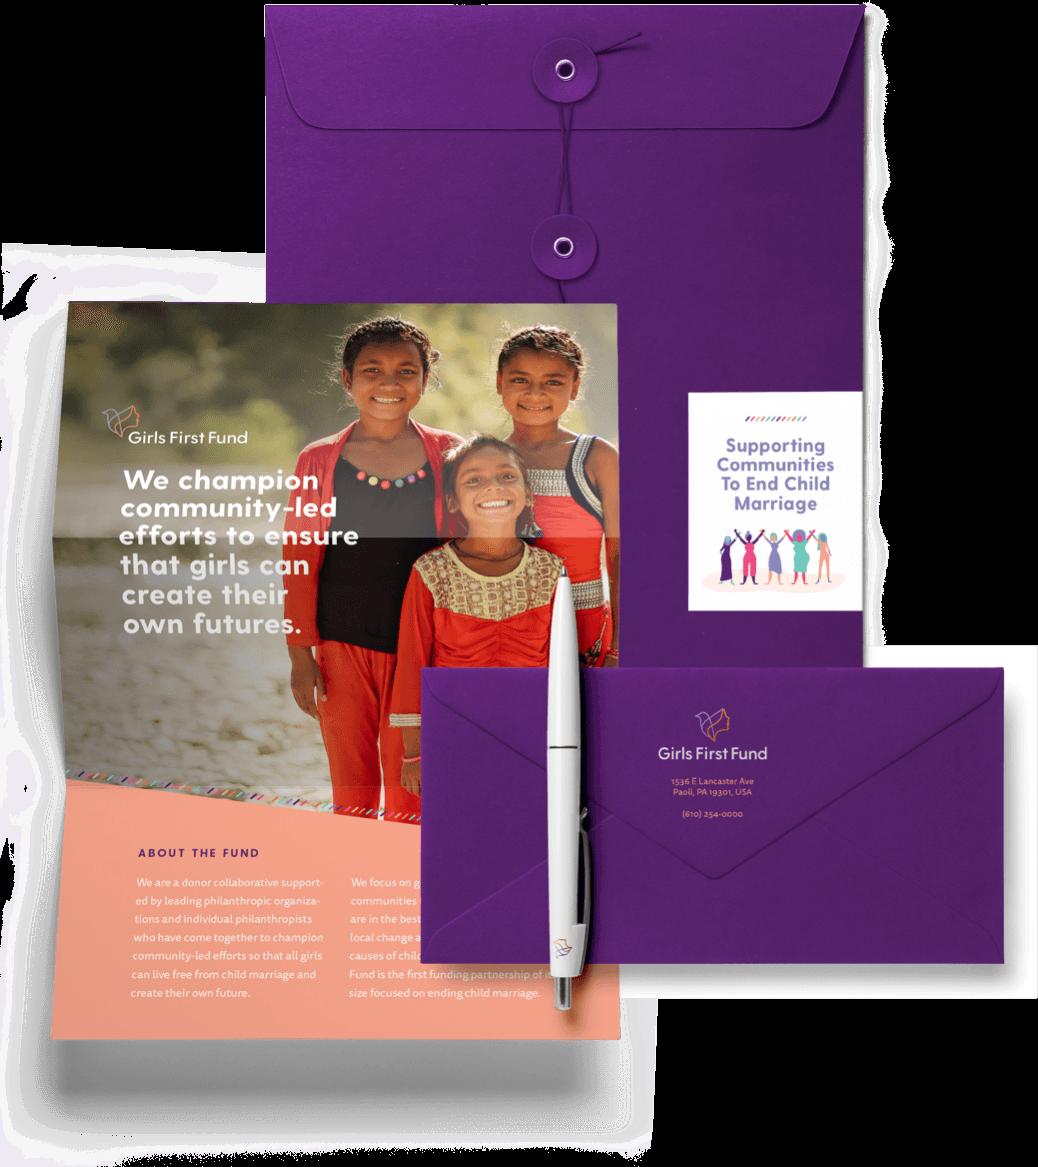 Branding for Girls First Fund